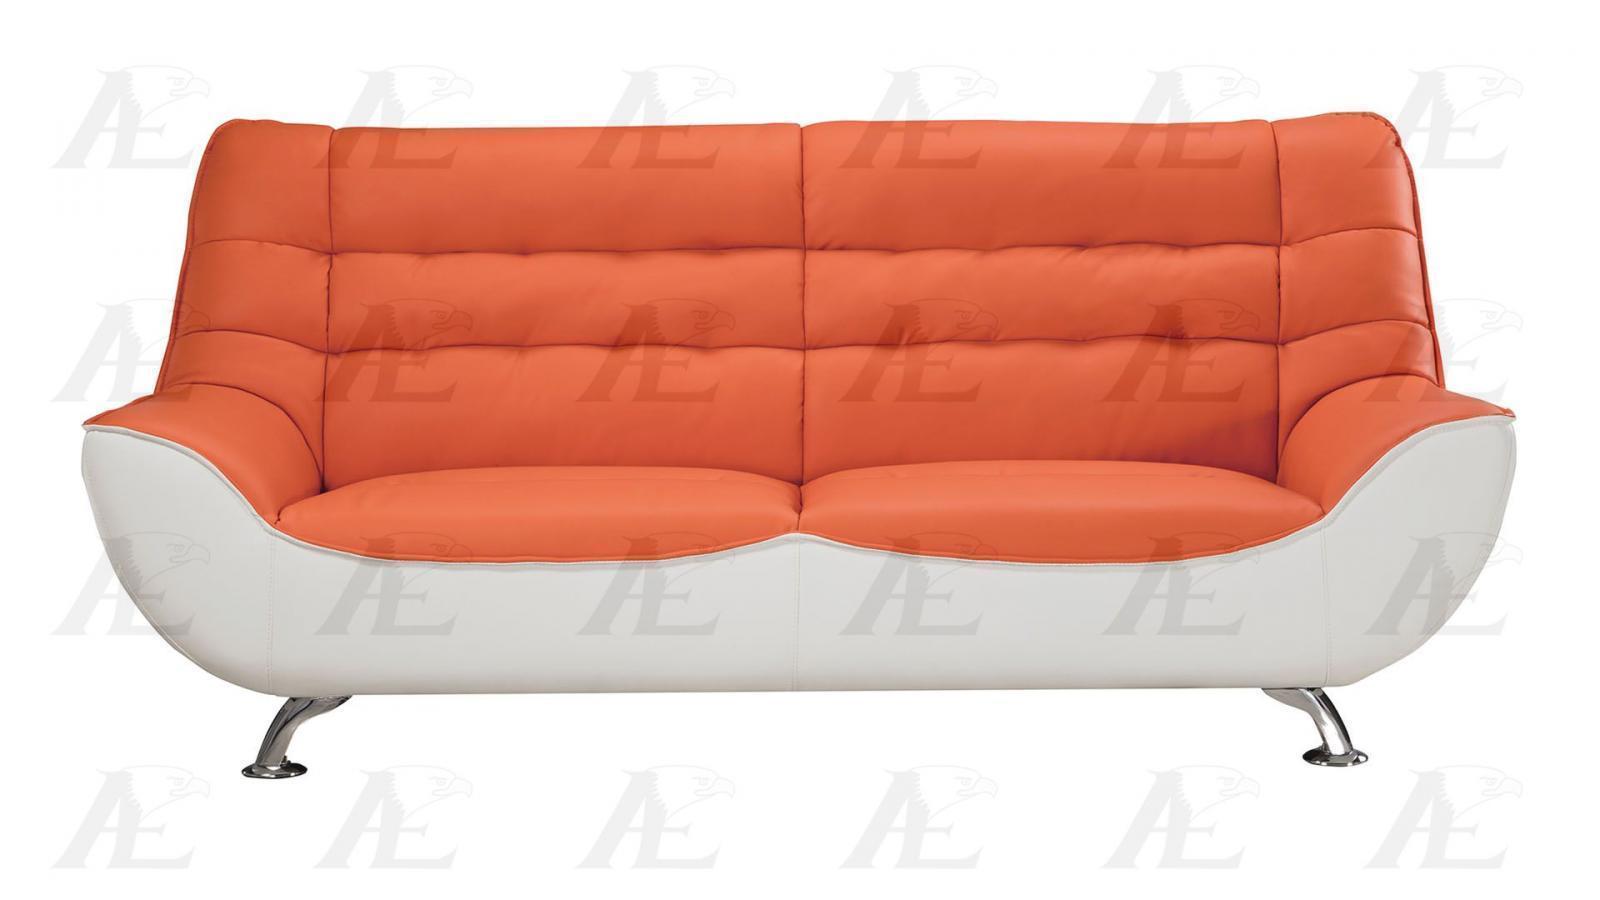 American Eagle Ae612 Org W Orange White Sofa And Loveseat Set Faux Leather 2pcs